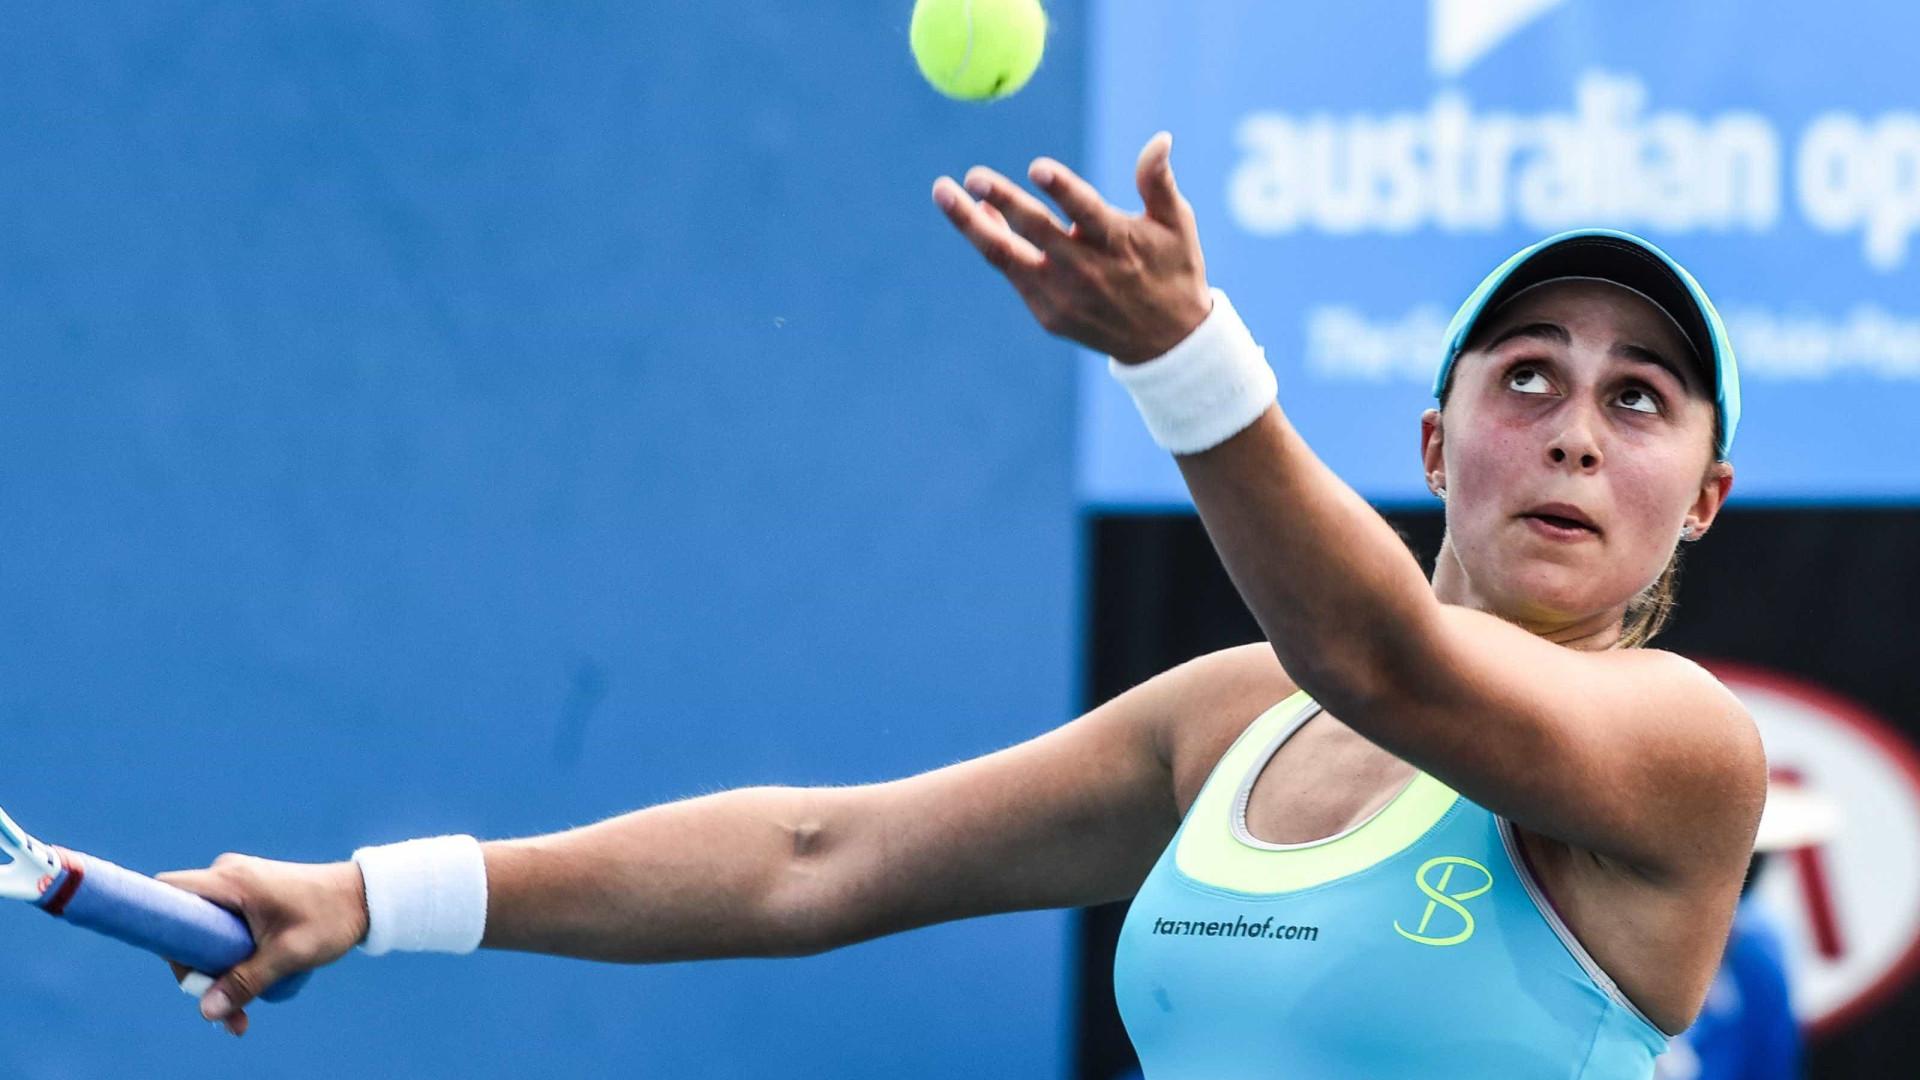 Tenista Tamira Paszek retira-se por tempo indeterminado